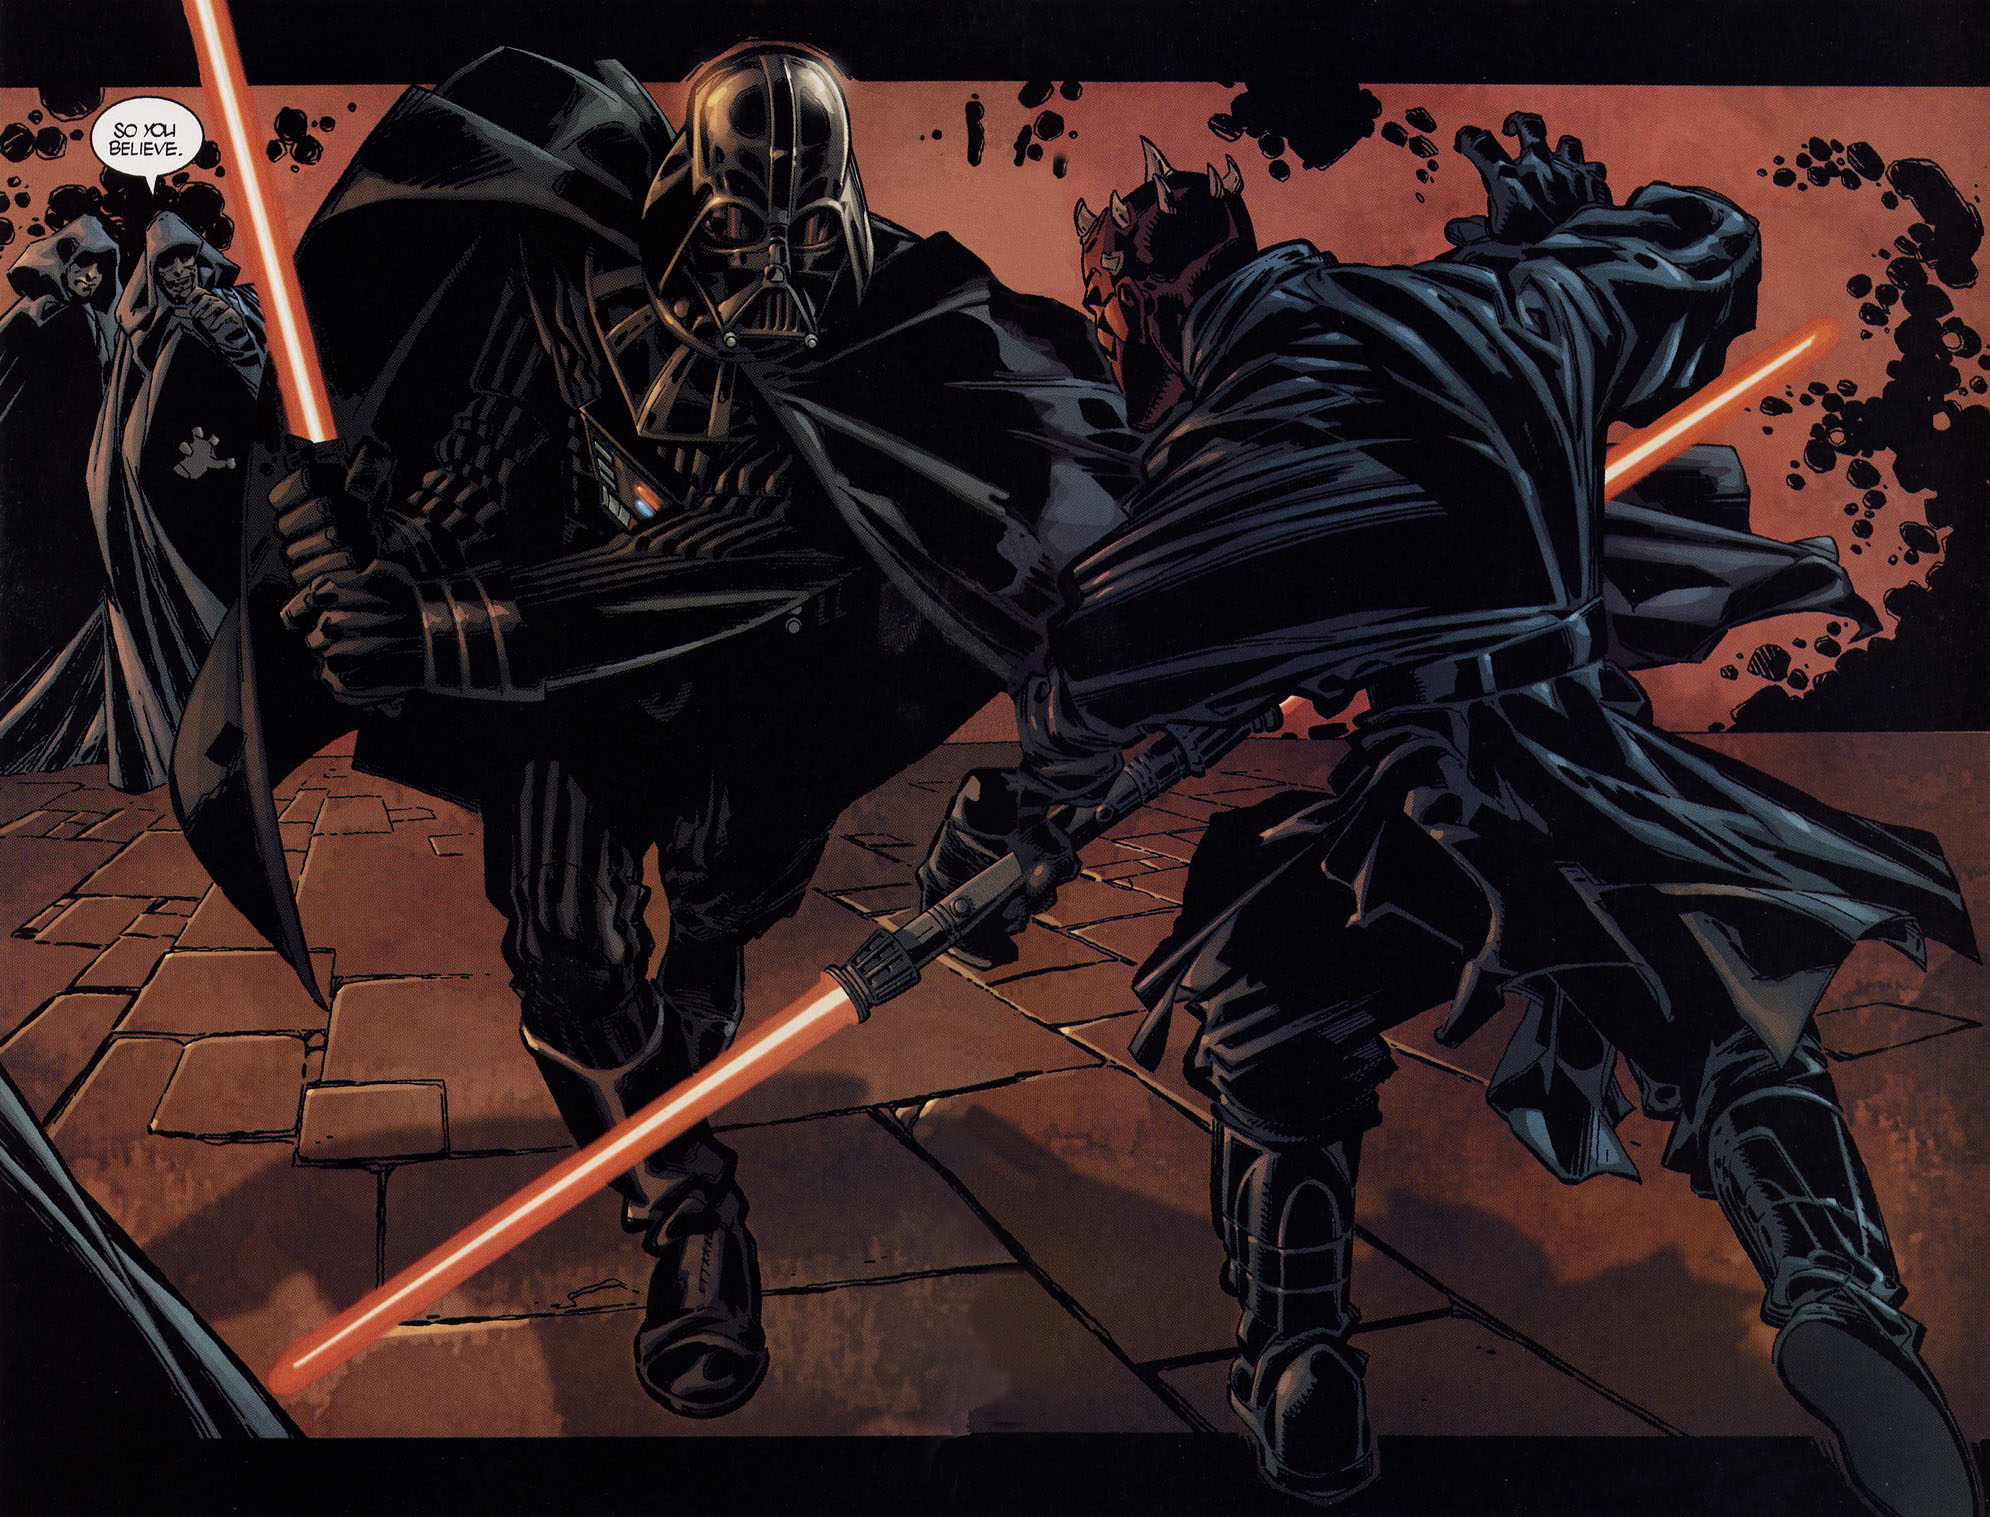 Darth Maul - Image - Star Wars Darth Vader Vs Darth Maul , HD Wallpaper & Backgrounds